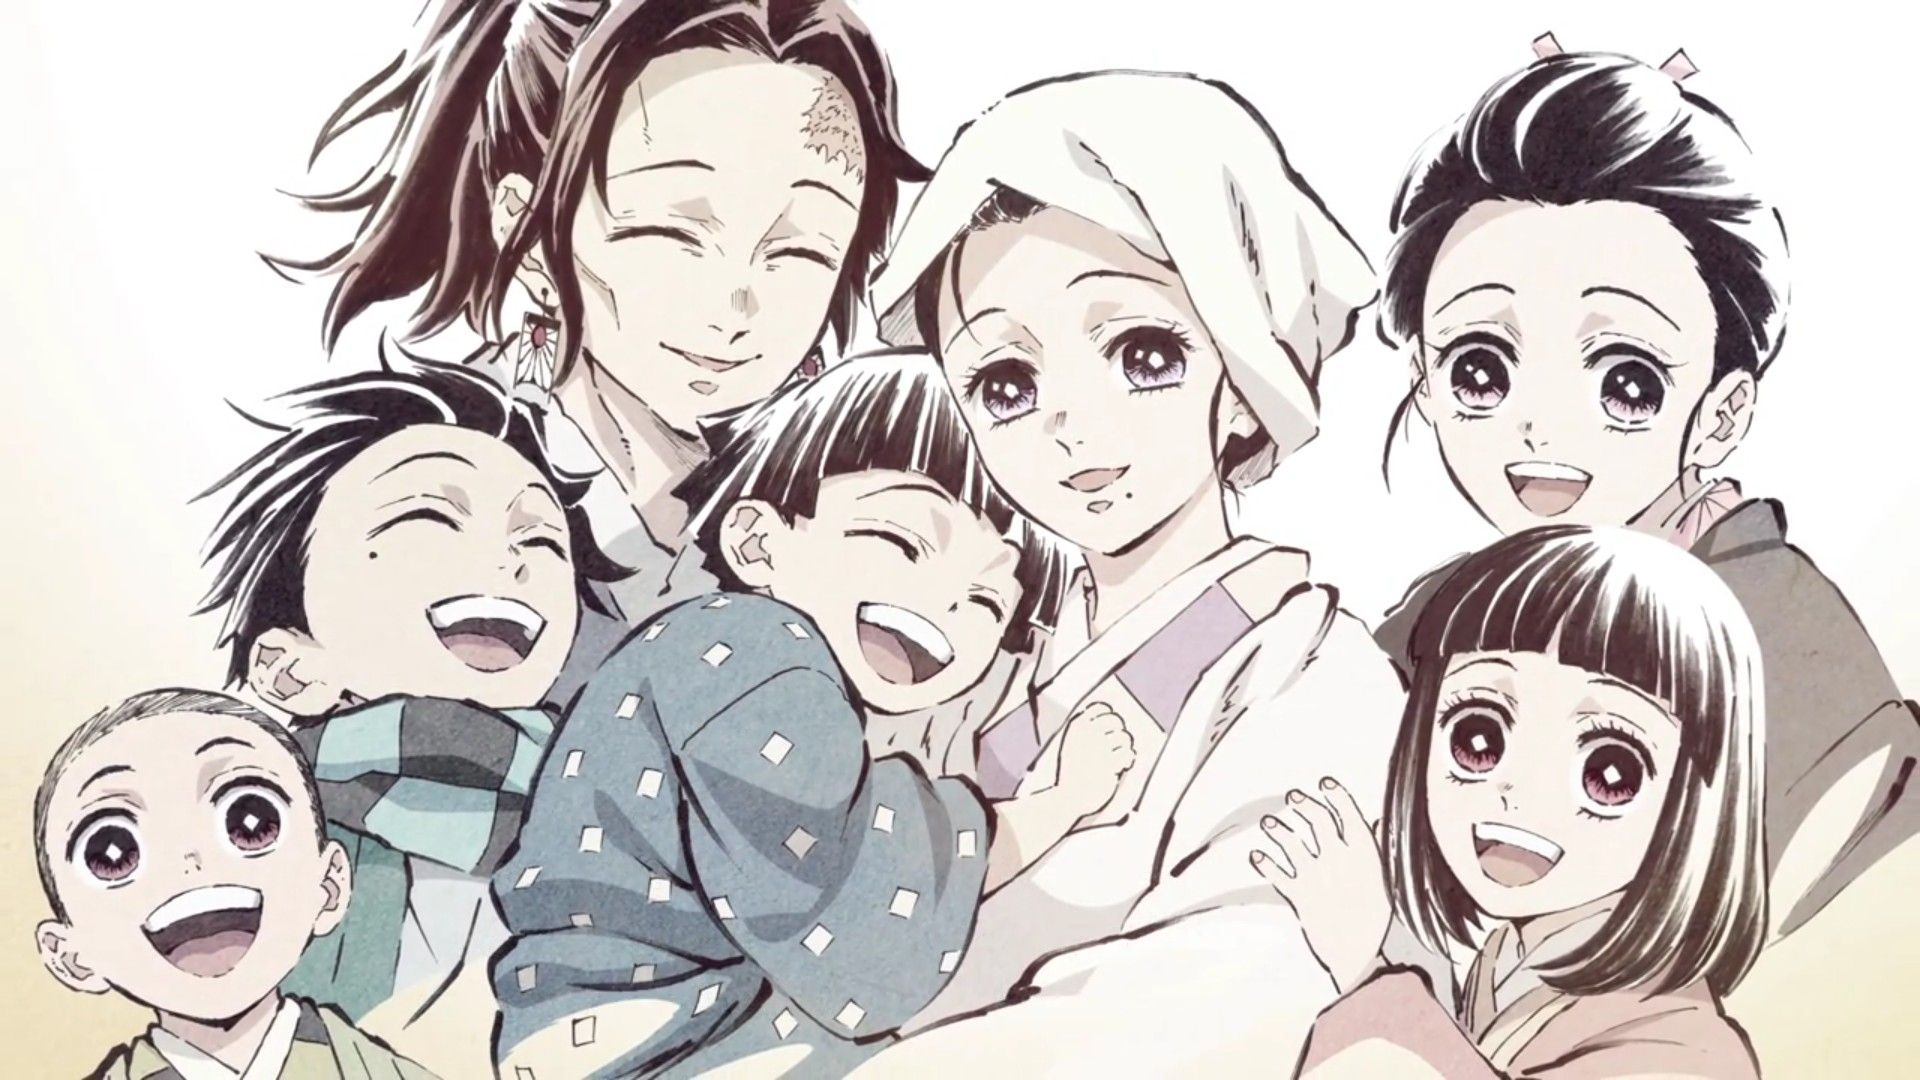 Tanjiro family   Anime demon, Anime, Slayer anime